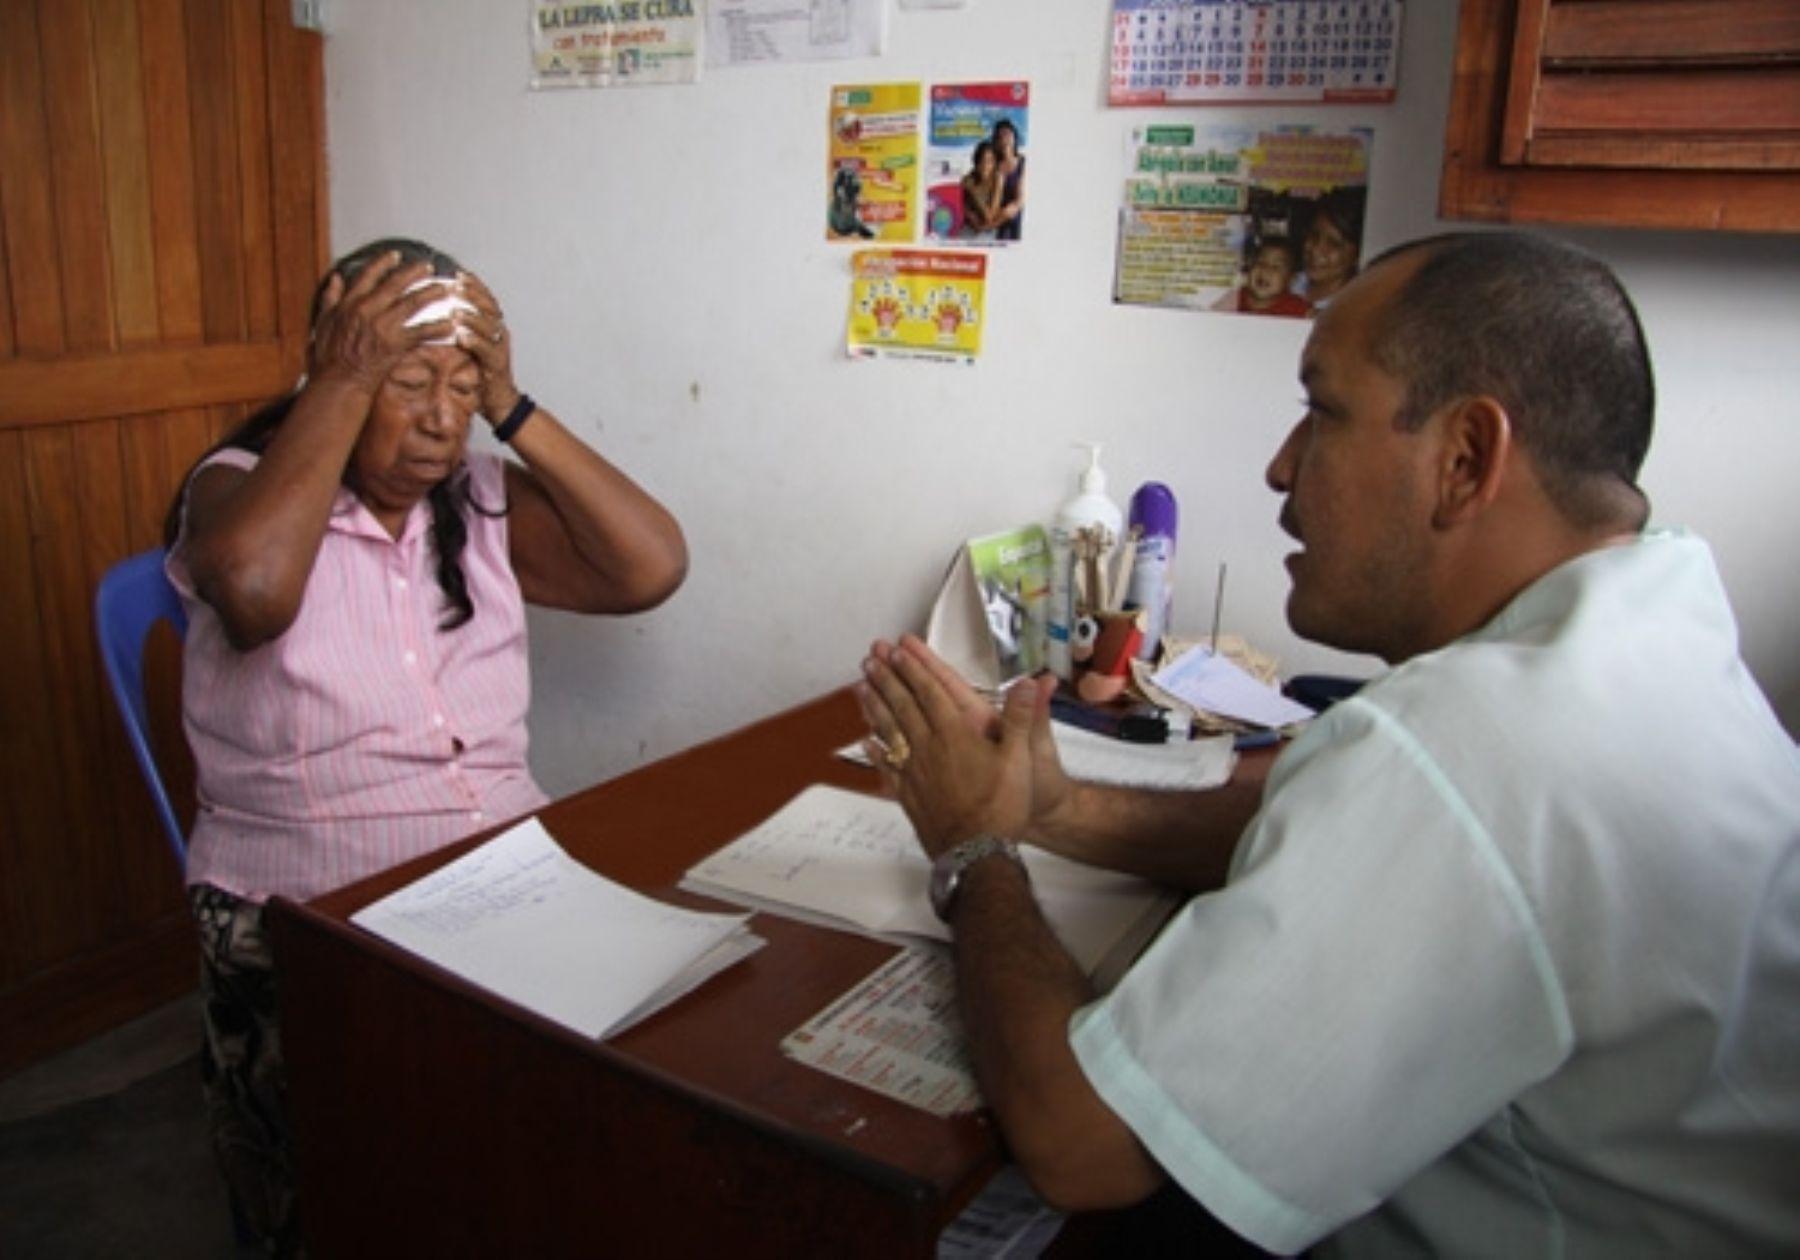 Atención méidca temprana se requiere en caso de ataques cerebrovasculares. Foto: ANDINA/Difusión